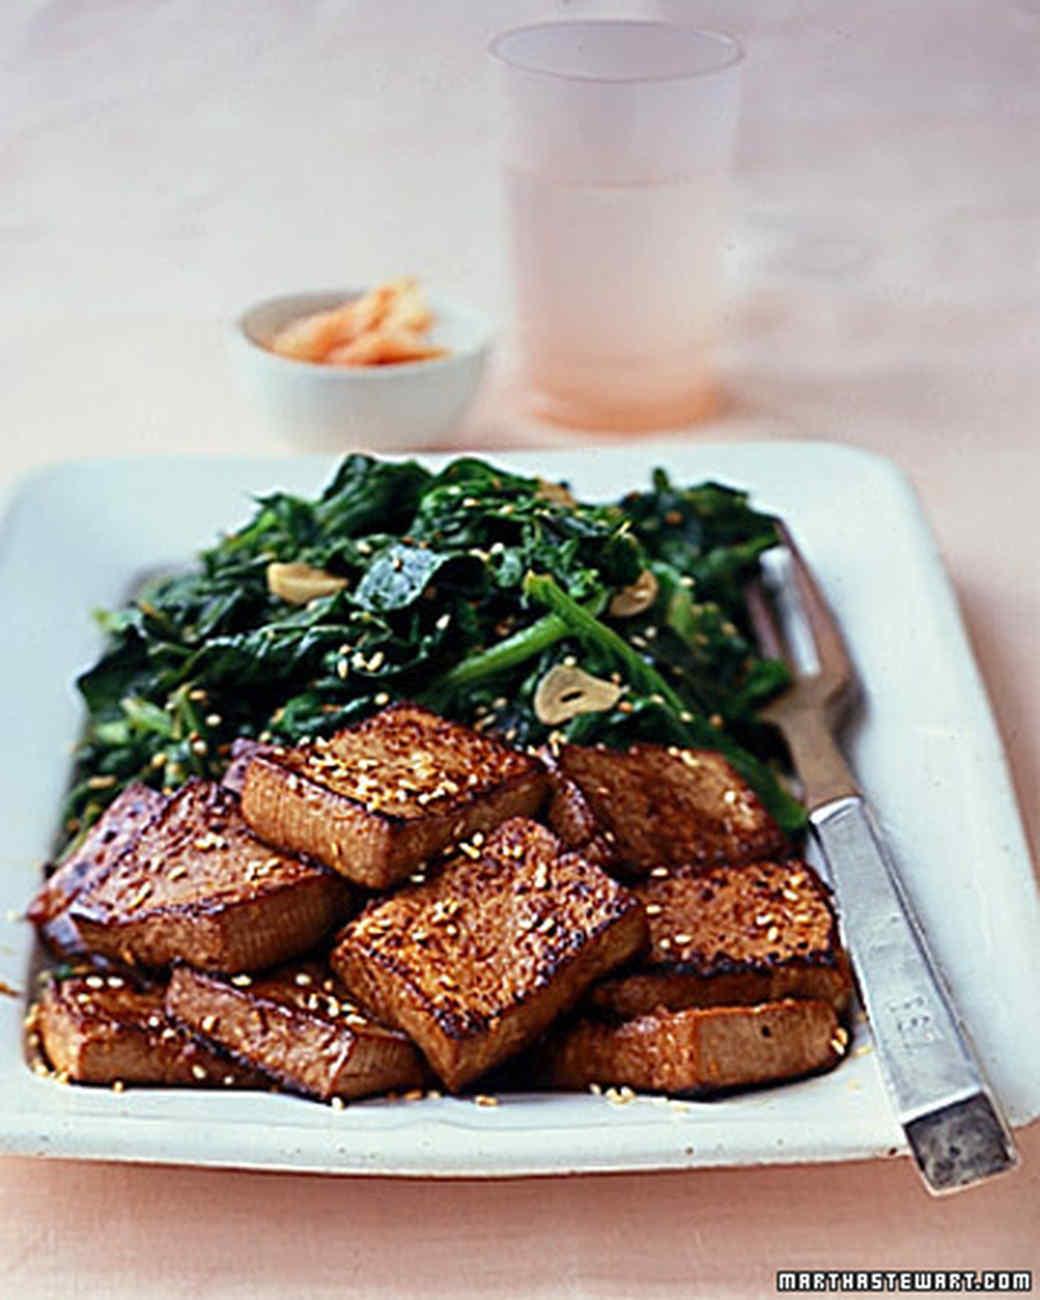 Sauteed Tofu with Bitter Greens